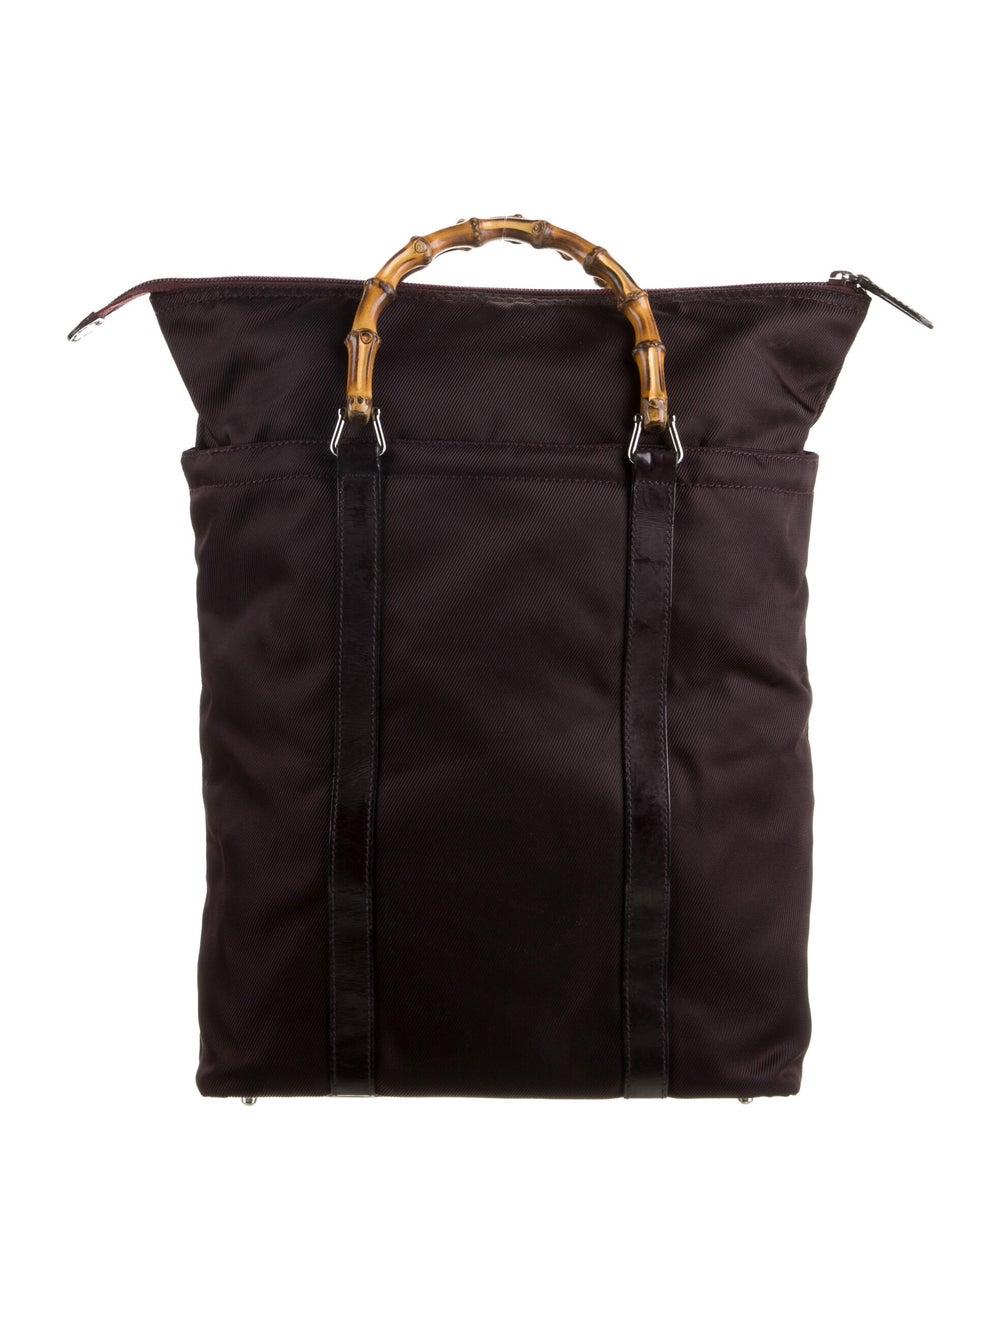 Gucci Canvas Bamboo Handle Bag Silver - image 4